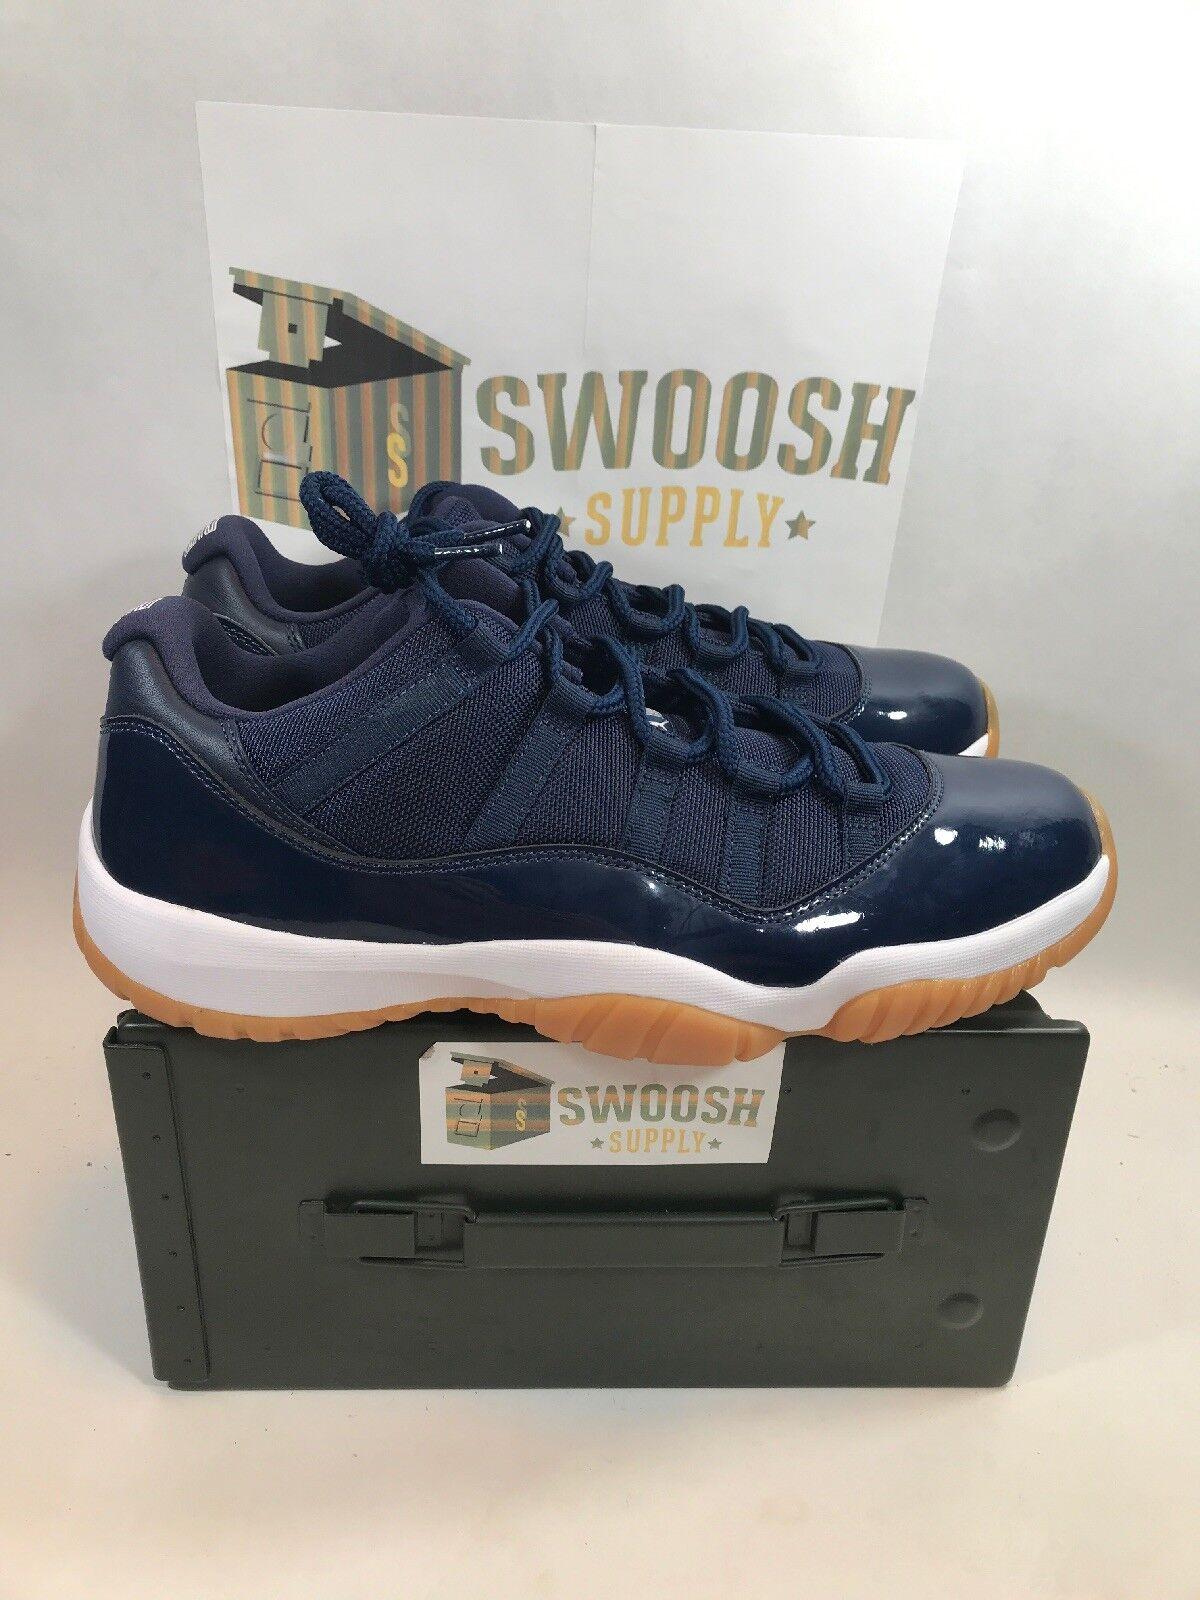 Nike Mens Air Jordan 11 Retro Low Size 13 Midnight Navy Gum 528895-405